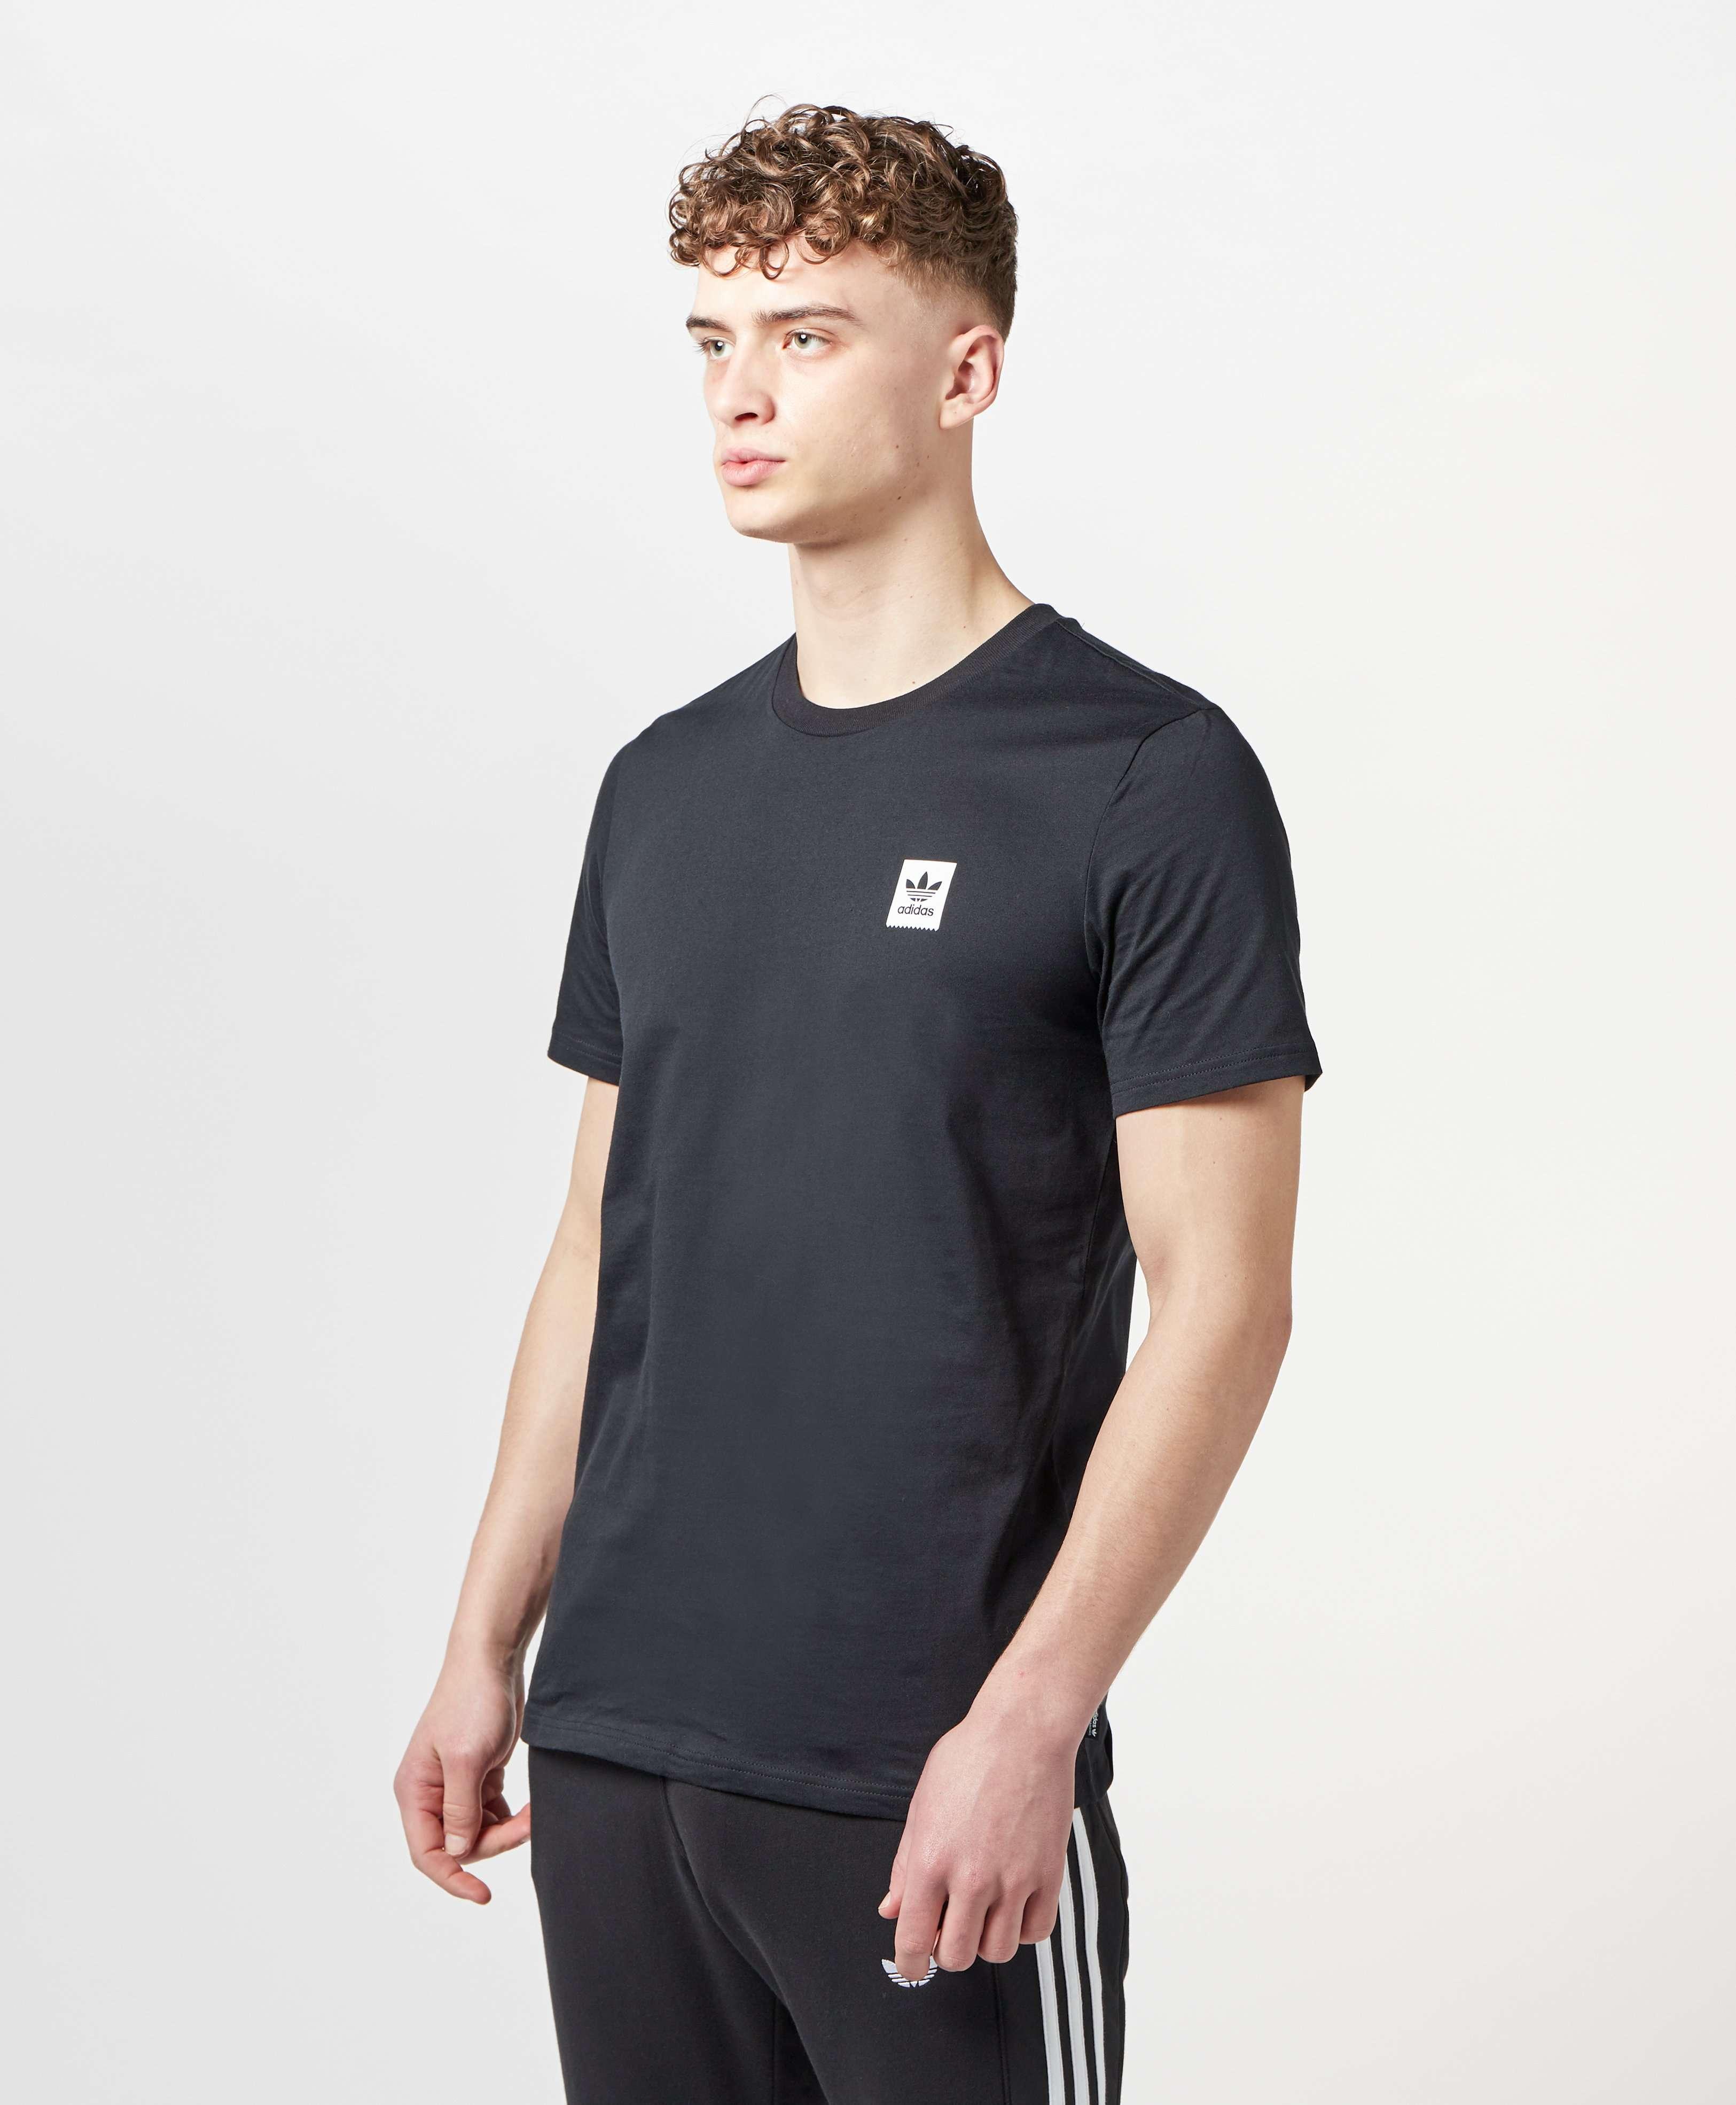 adidas Originals Short Sleeve Logo T-Shirt